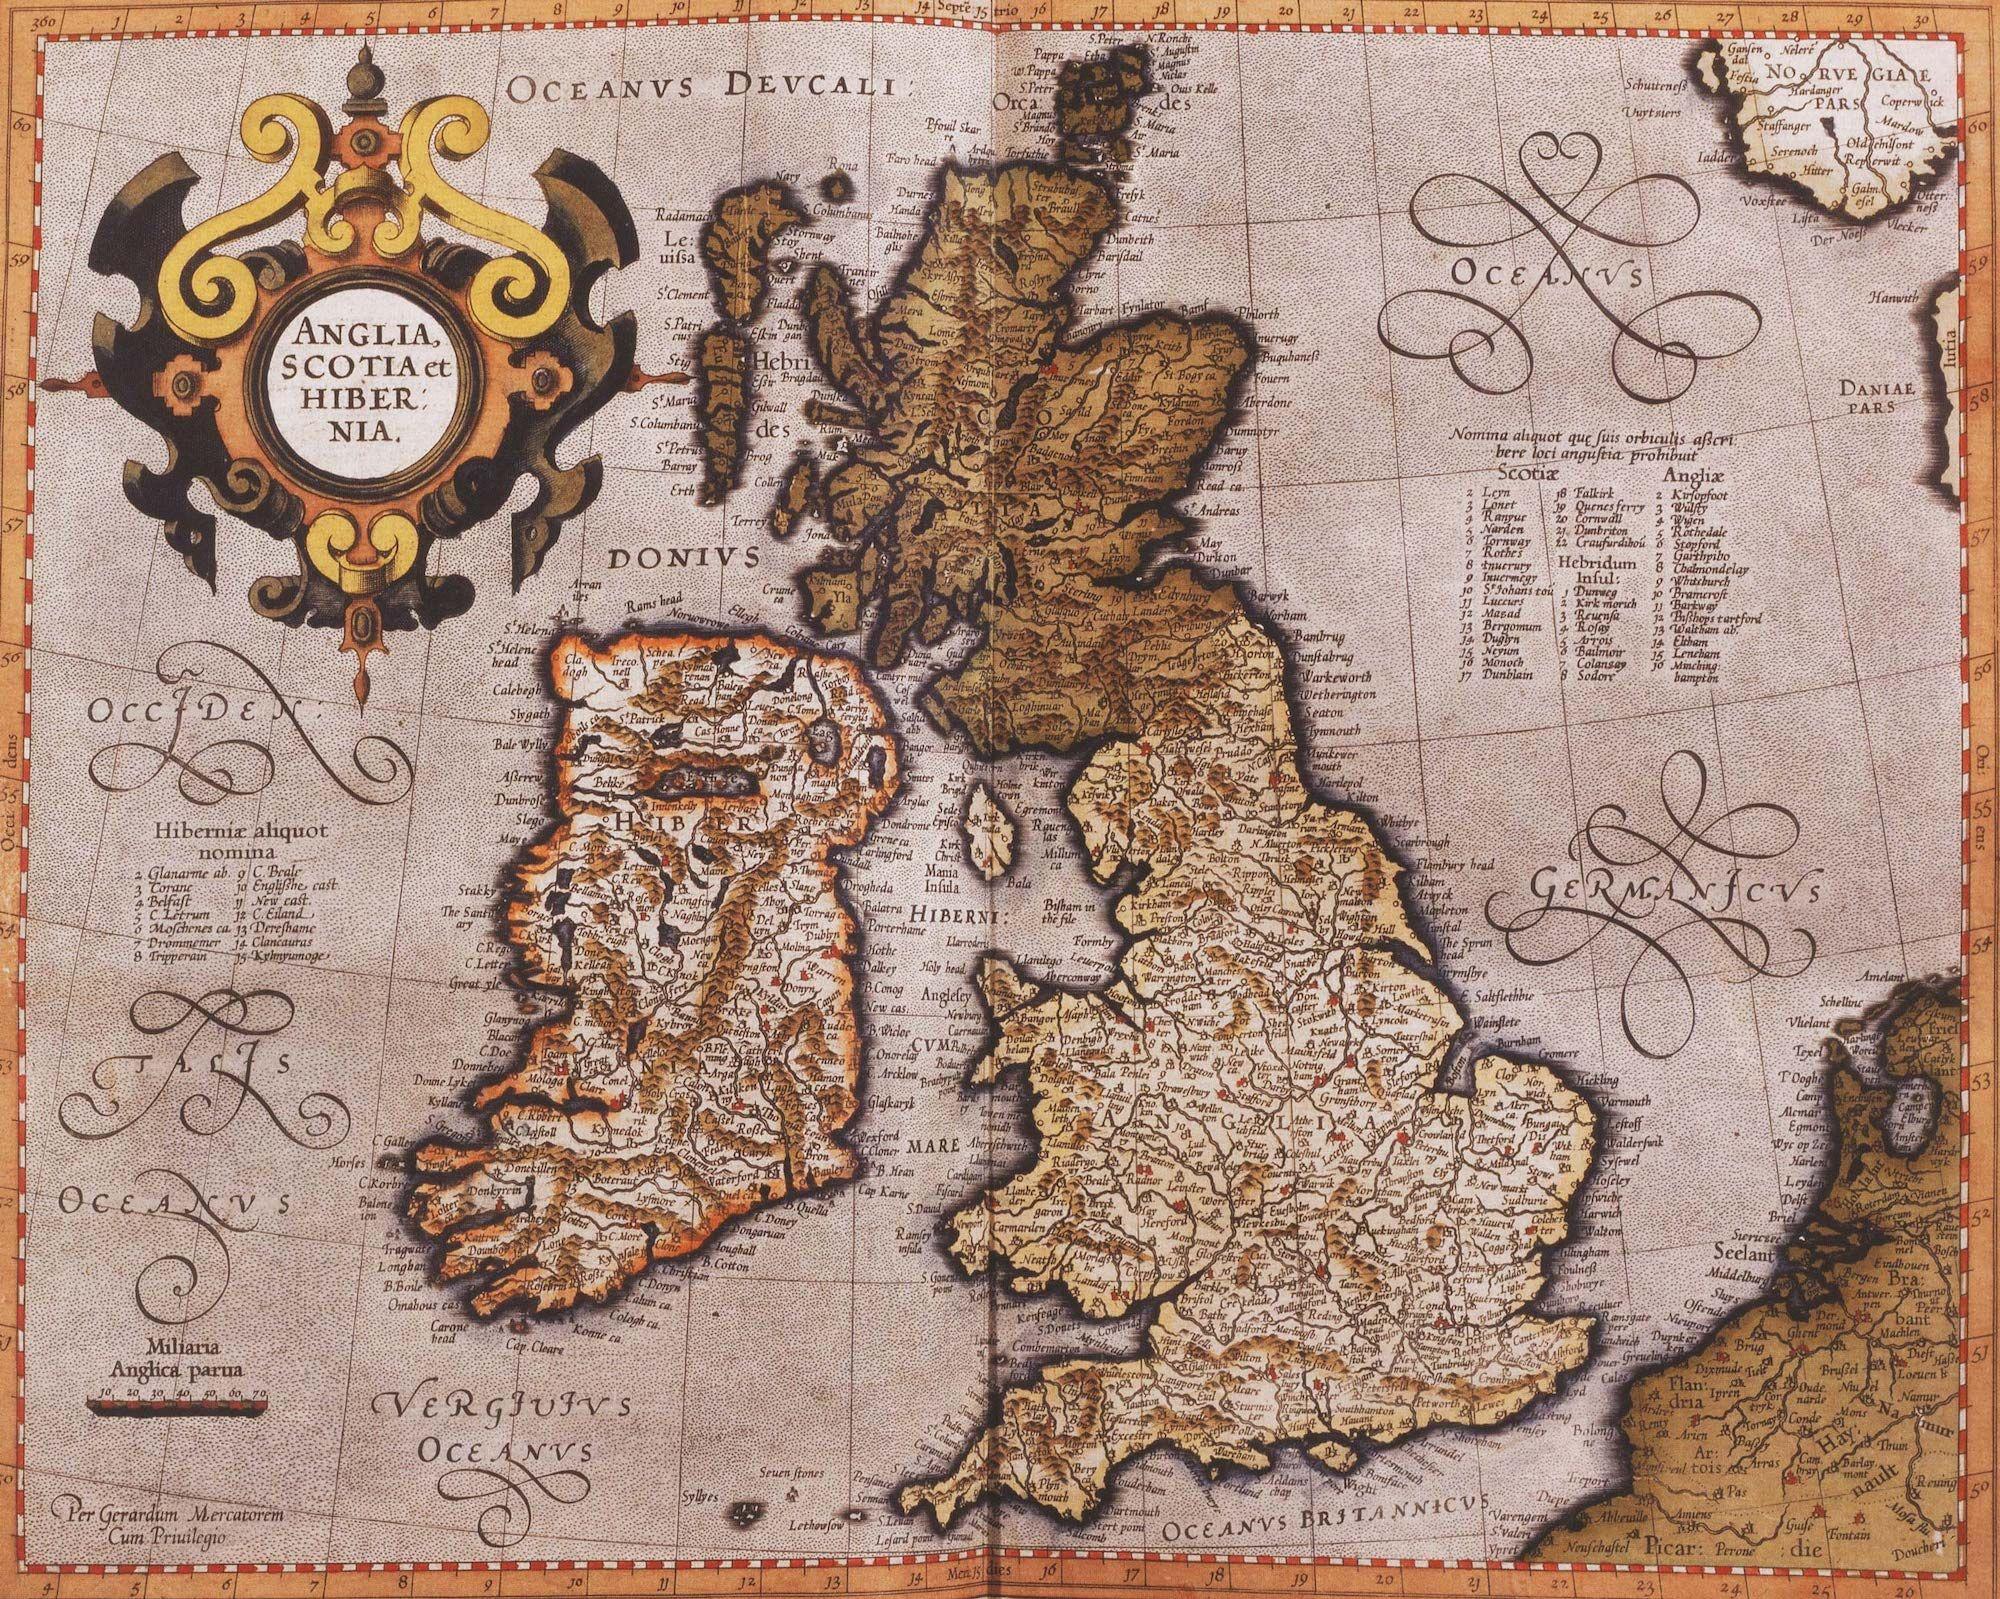 Fonte: G. Mercatore, «Anglia, Scotia et Hibernia», da Atlas sive cosmographicae meditationes de fabrica mundi et fabricati figura, Duisburg 1595.